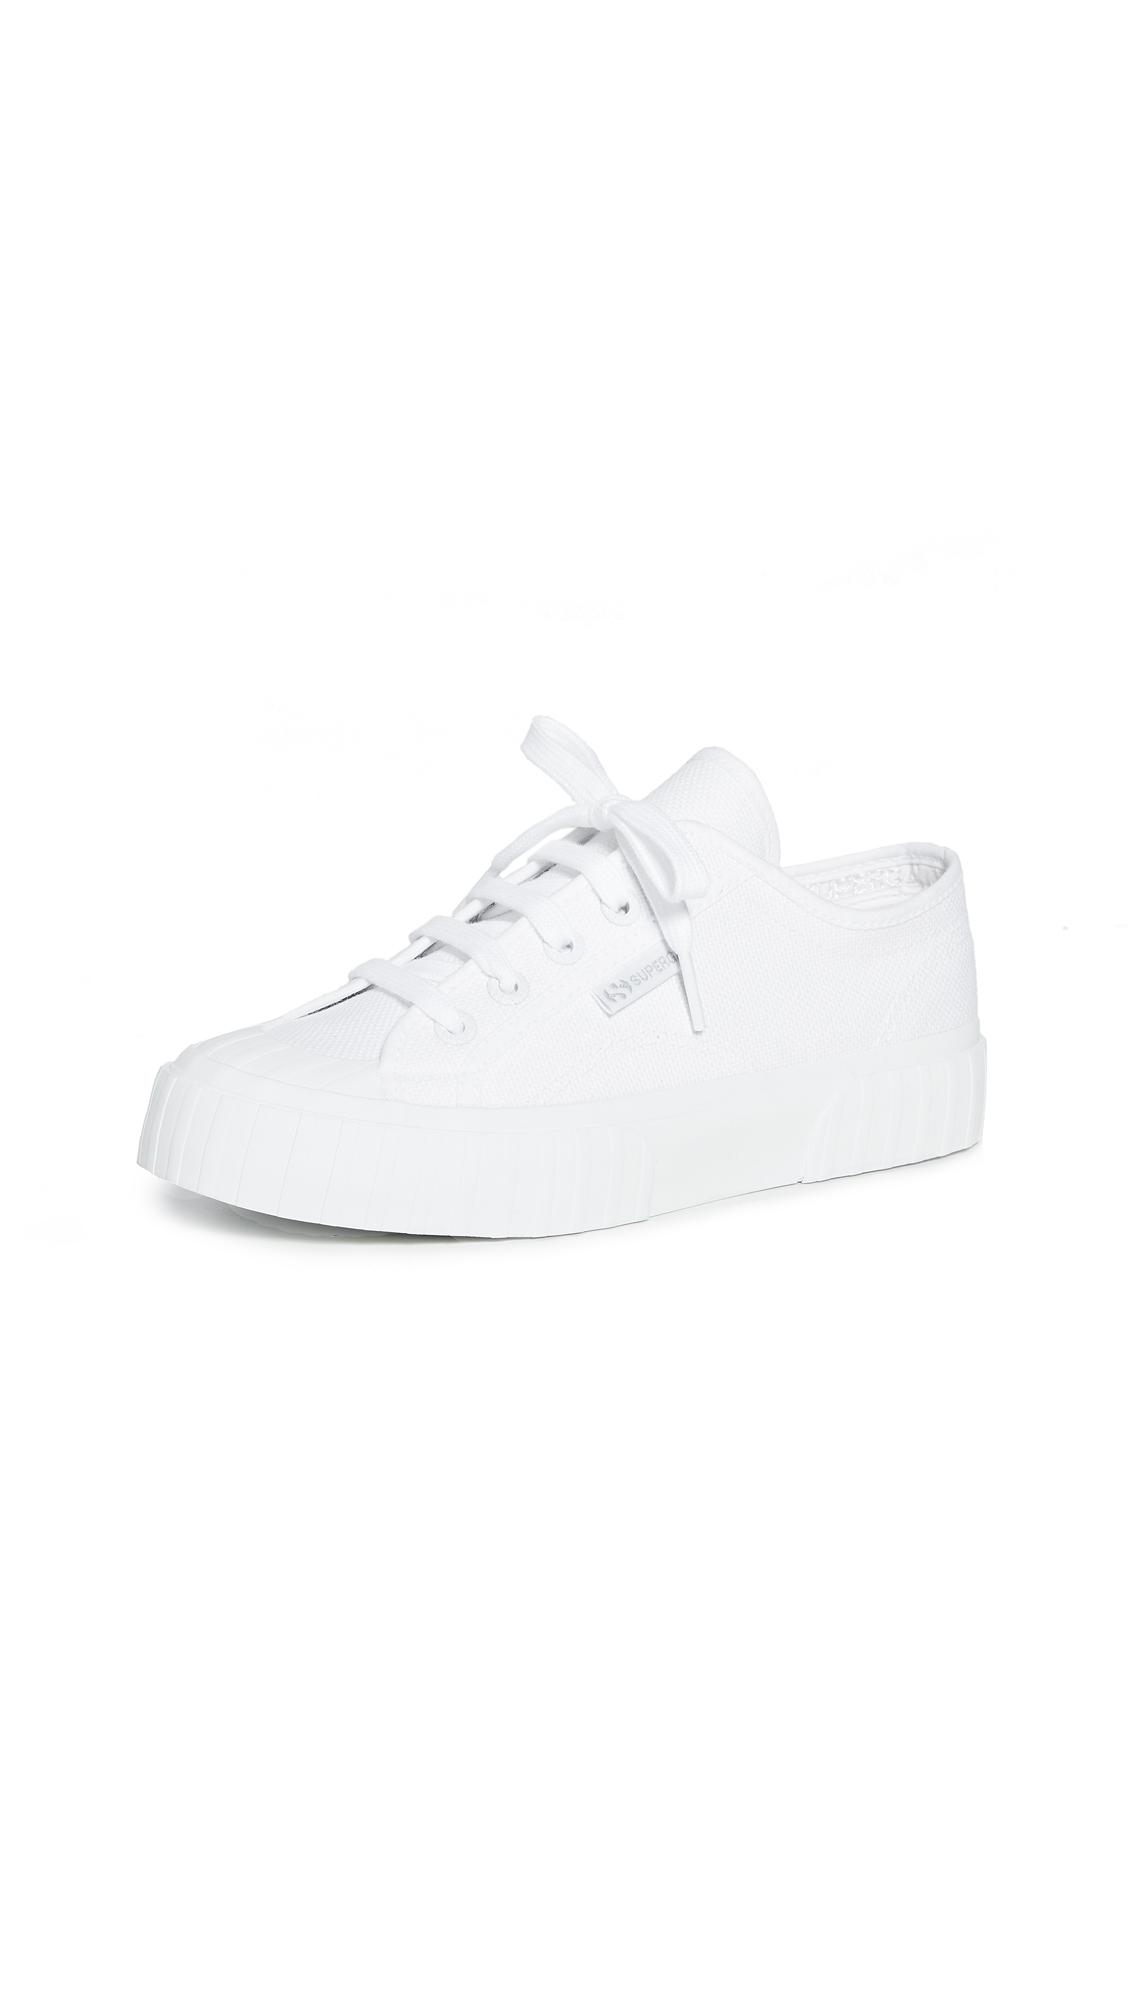 Buy Superga online - photo of Superga 2630 Cotu Laceup Sneakers